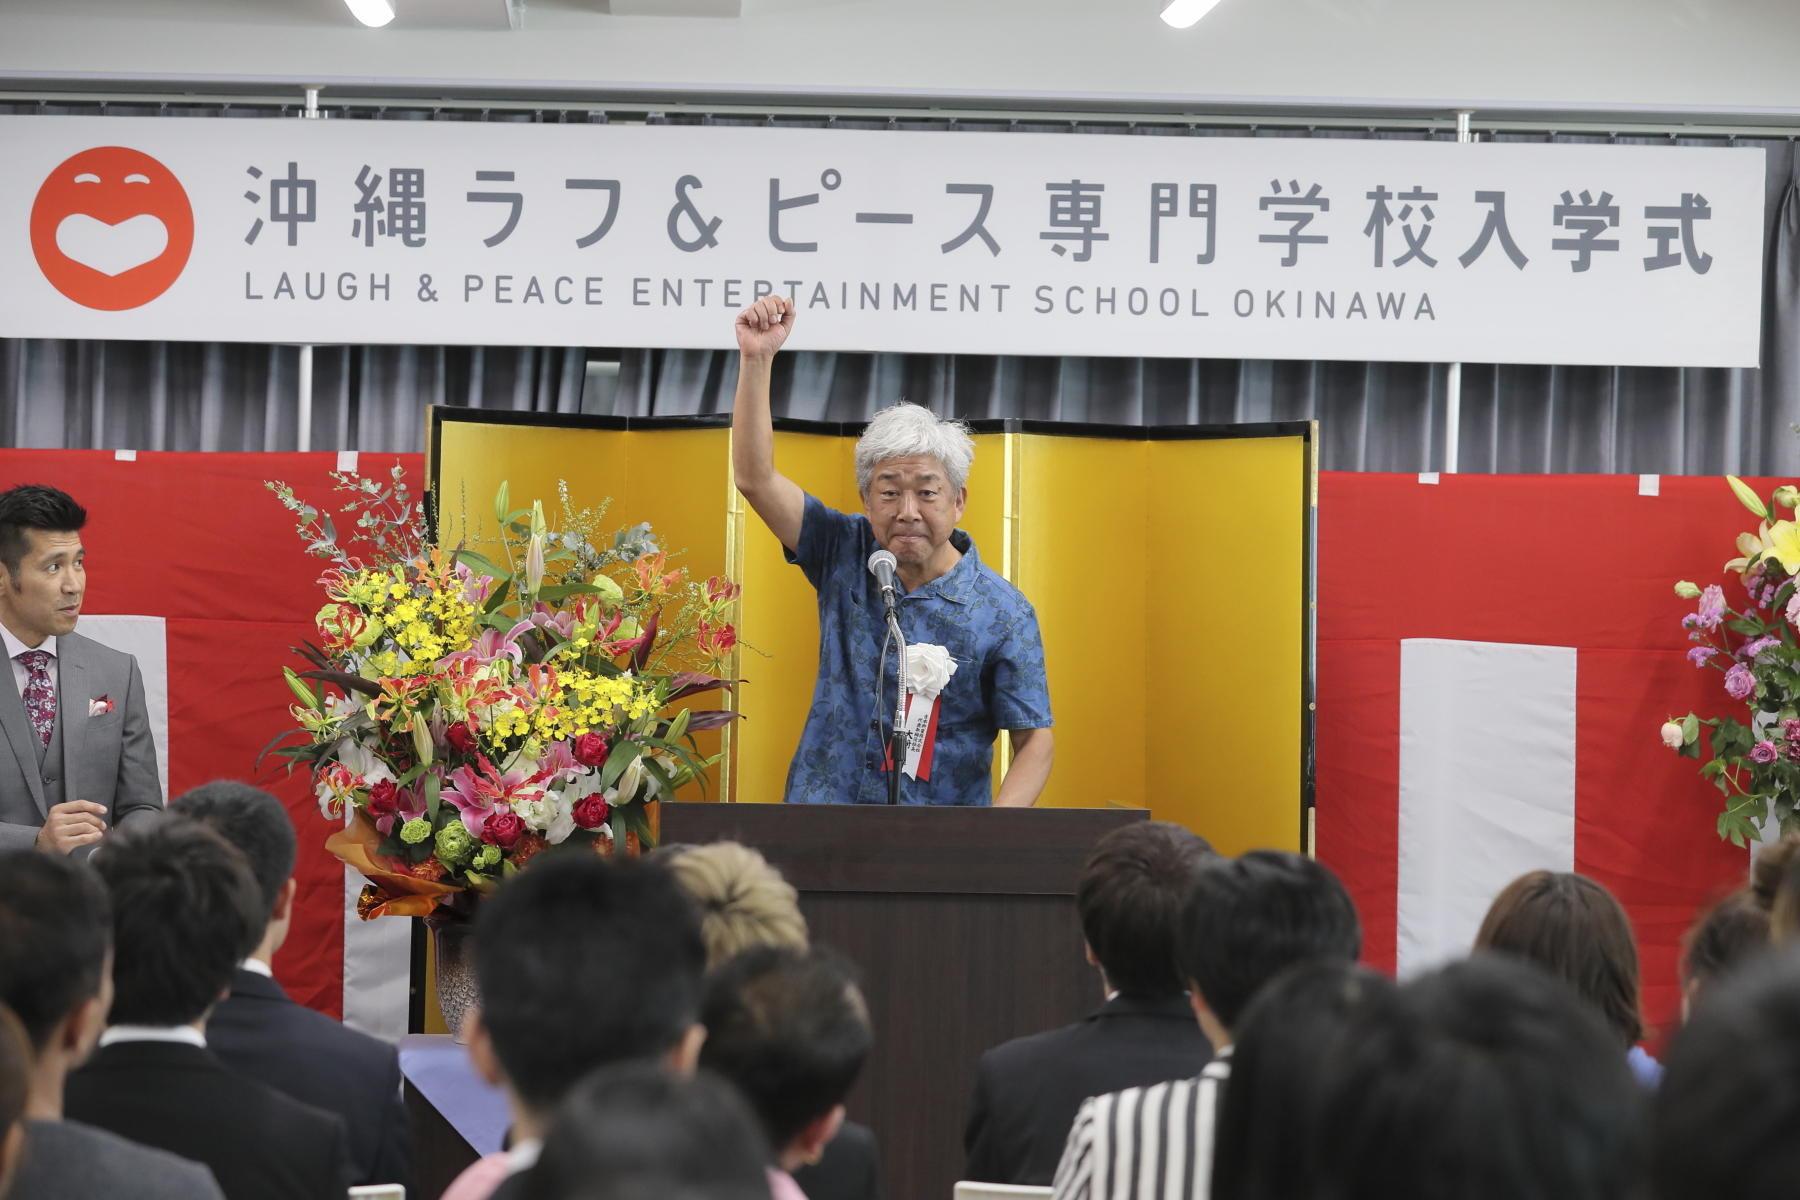 http://news.yoshimoto.co.jp/20180409185548-c434a7be155f99fa631f0cabee1e2a529fbd5498.jpg